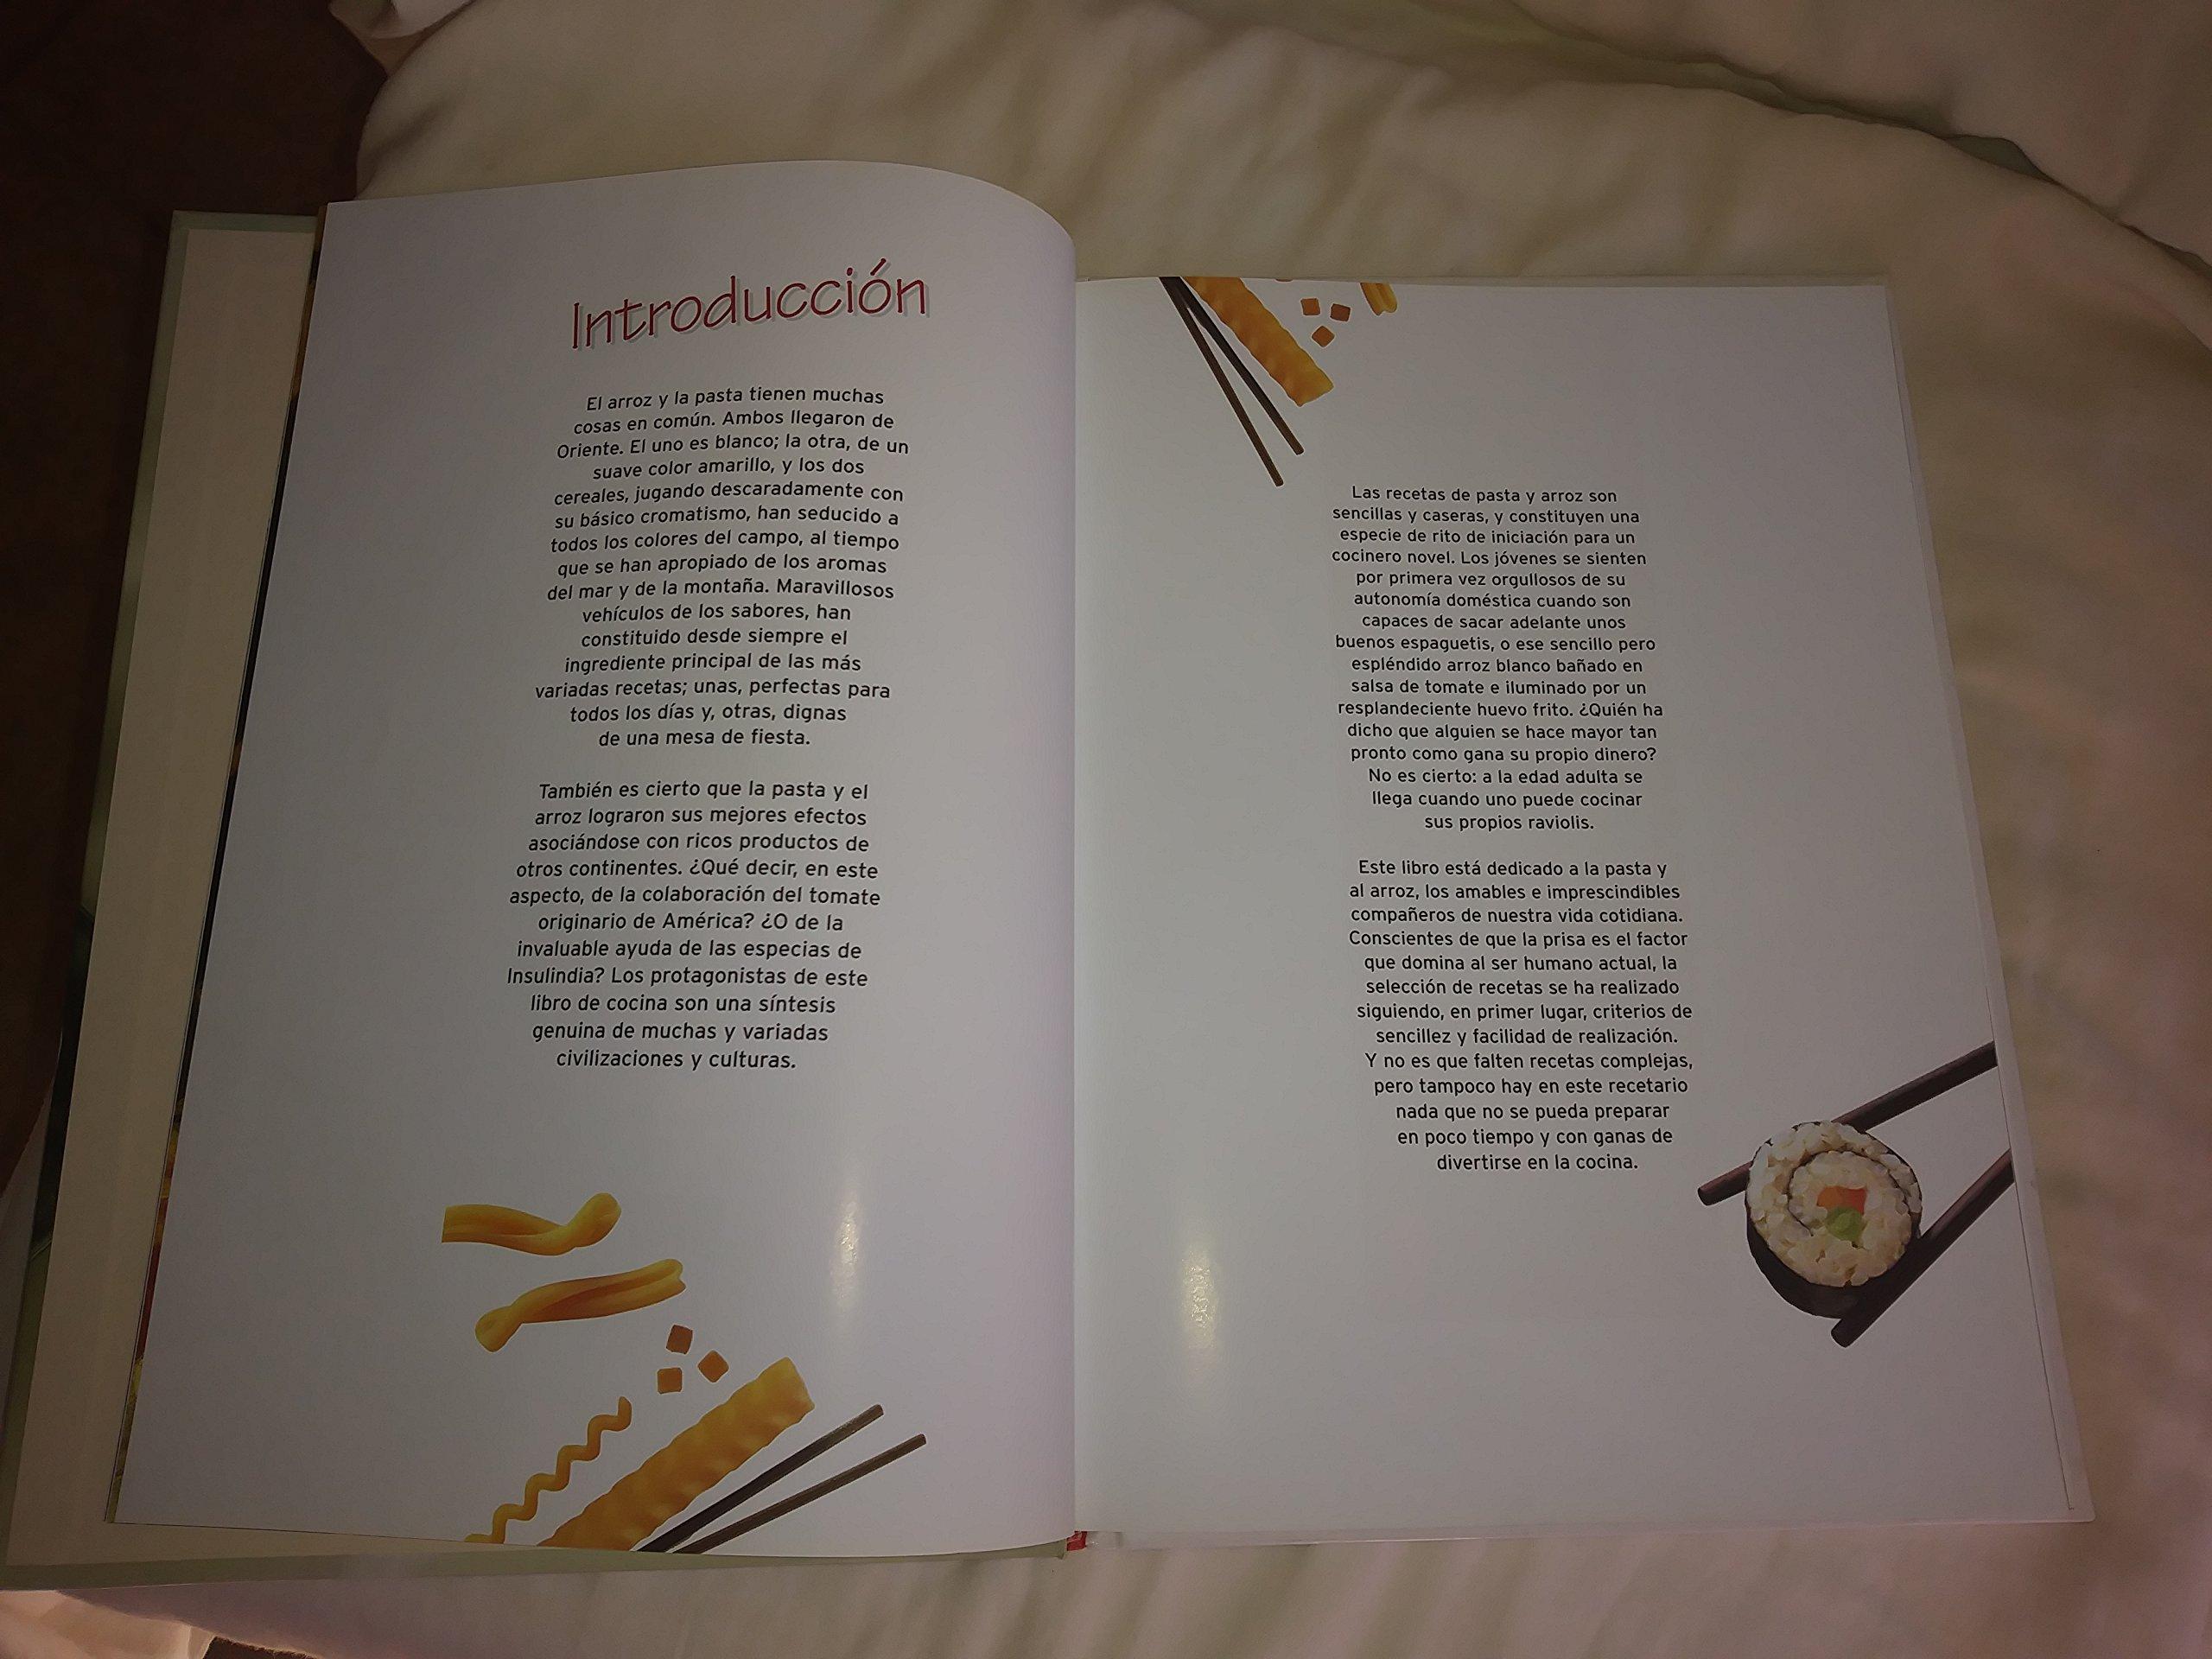 sal de la olla cocina paso a paso trucos culinarios: editorial planeta colombiana, igda, fernando ramajo: 9788439594406: Amazon.com: Books